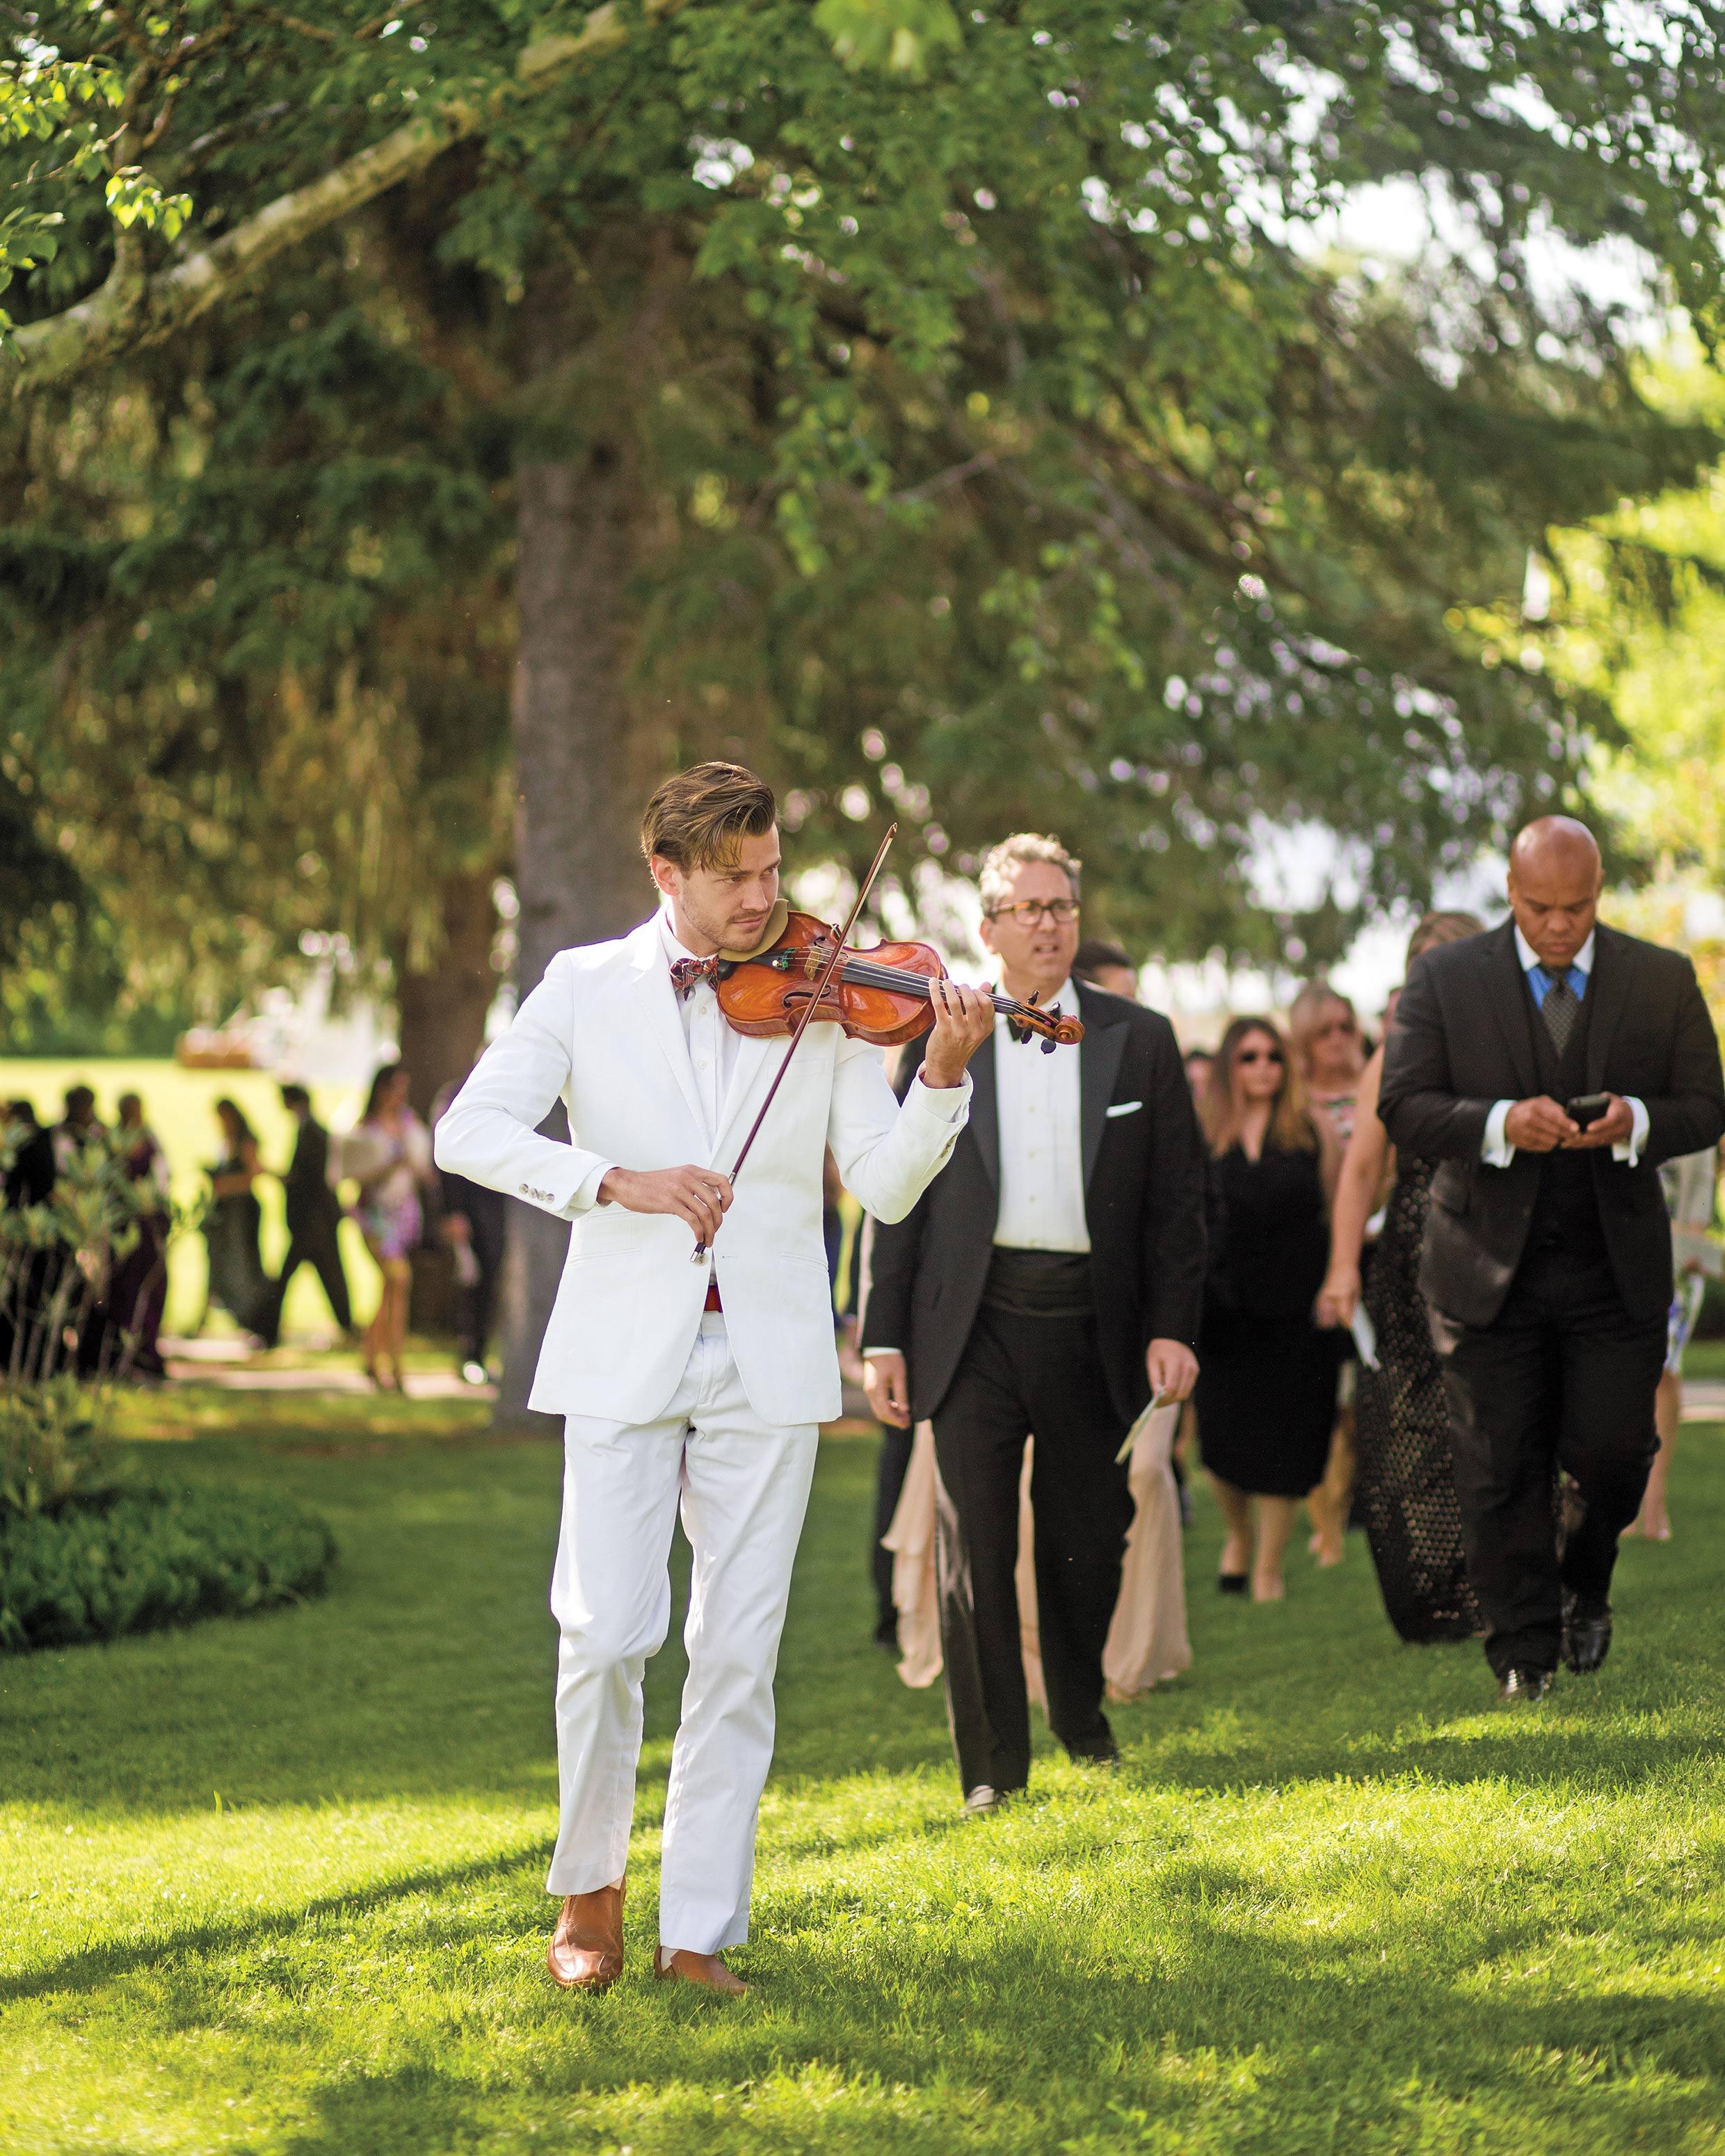 mhonor-jay-wedding-connecticut-potrait-bride-and-groom-0733-d112238.jpg